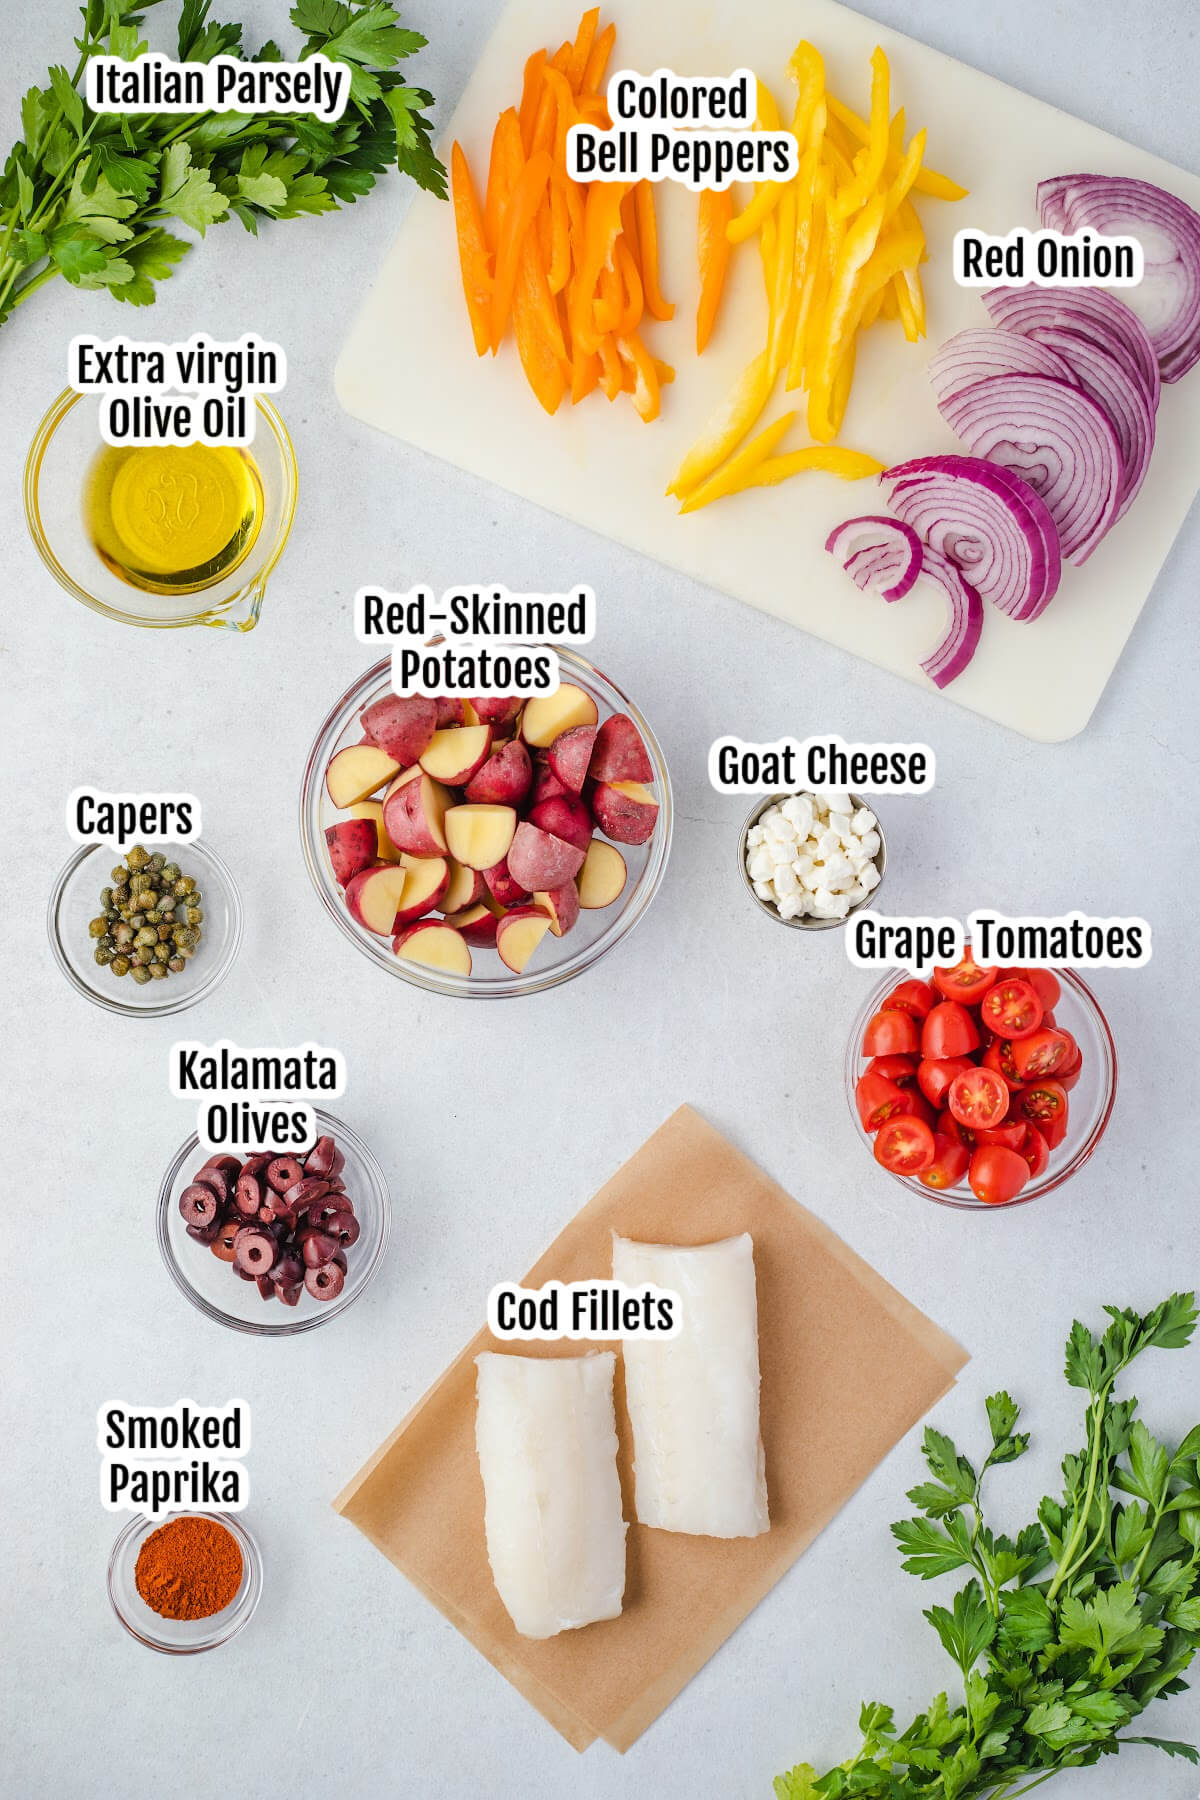 Photo of the Mediterranean cod ingredients.